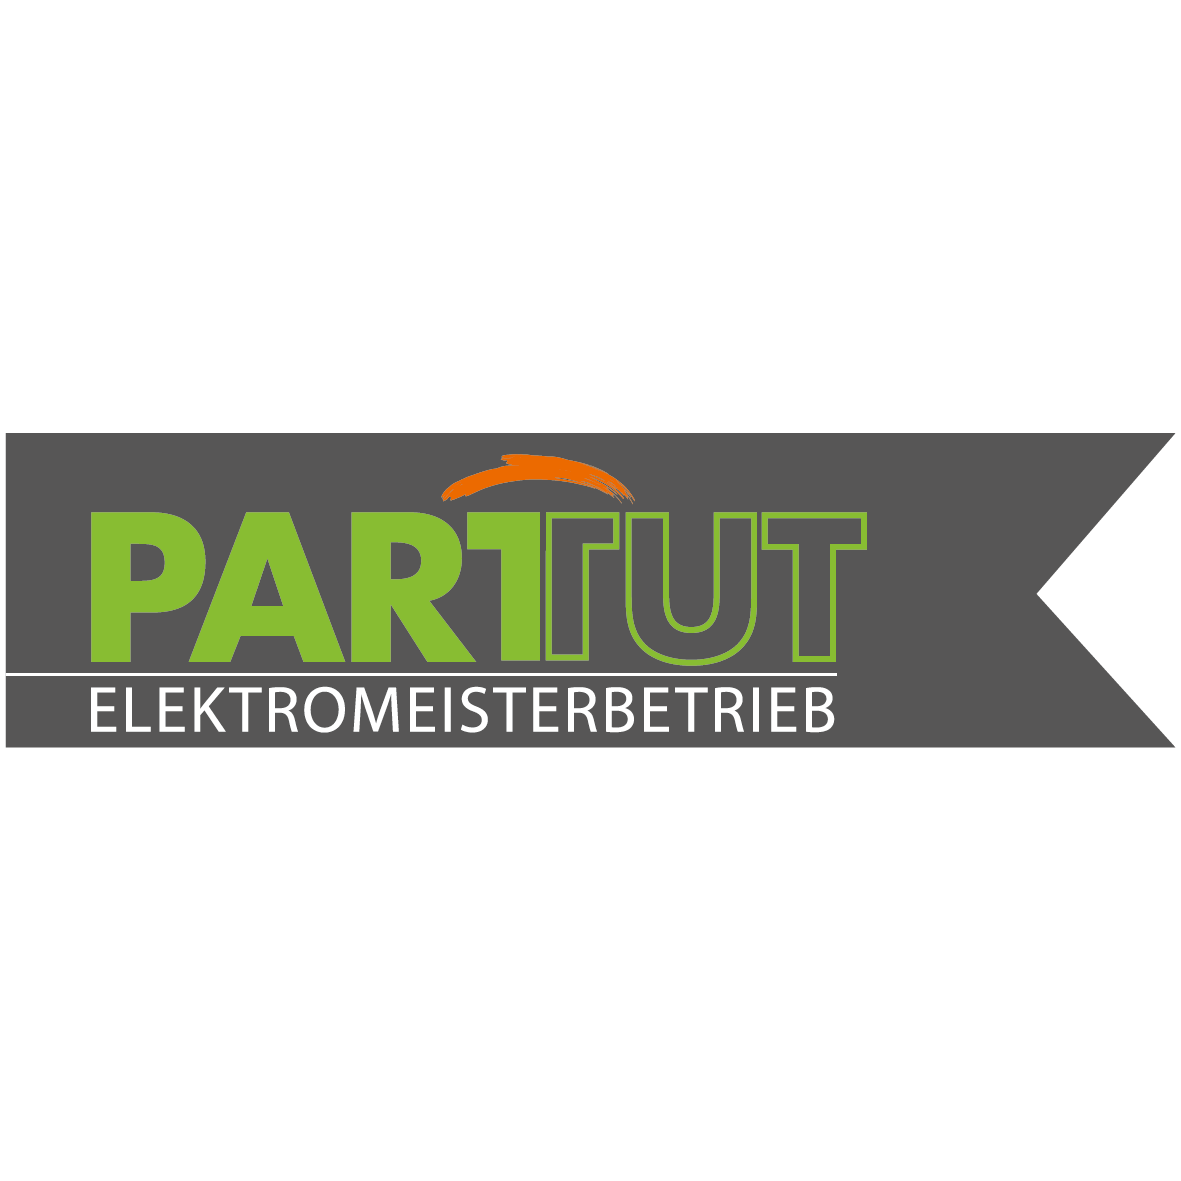 PARTUT Elektromeisterbetrieb Inh. Dominik Schmidt